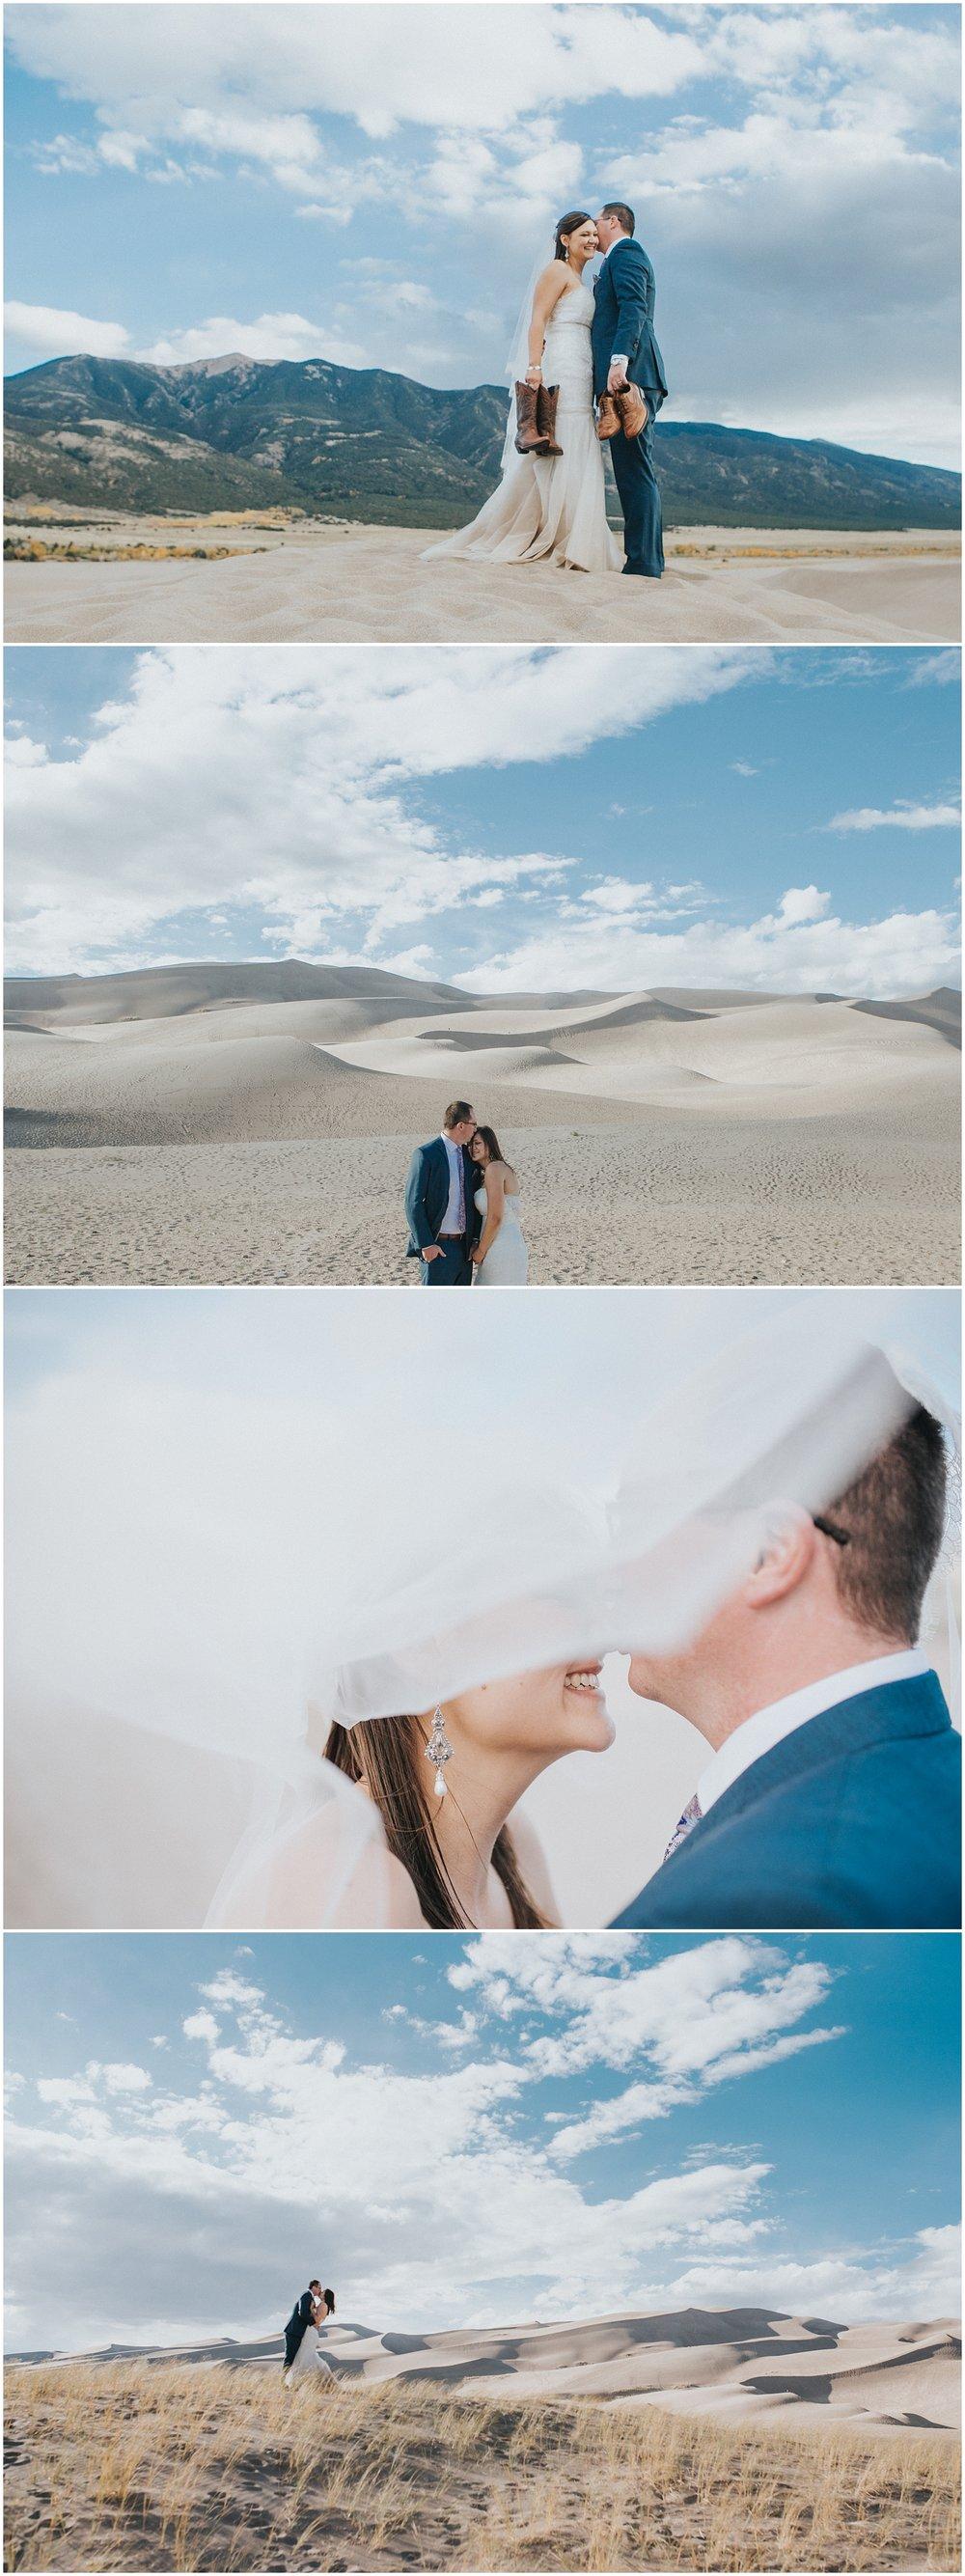 sand-dunes-national-park-wedding-photos_0015.jpg